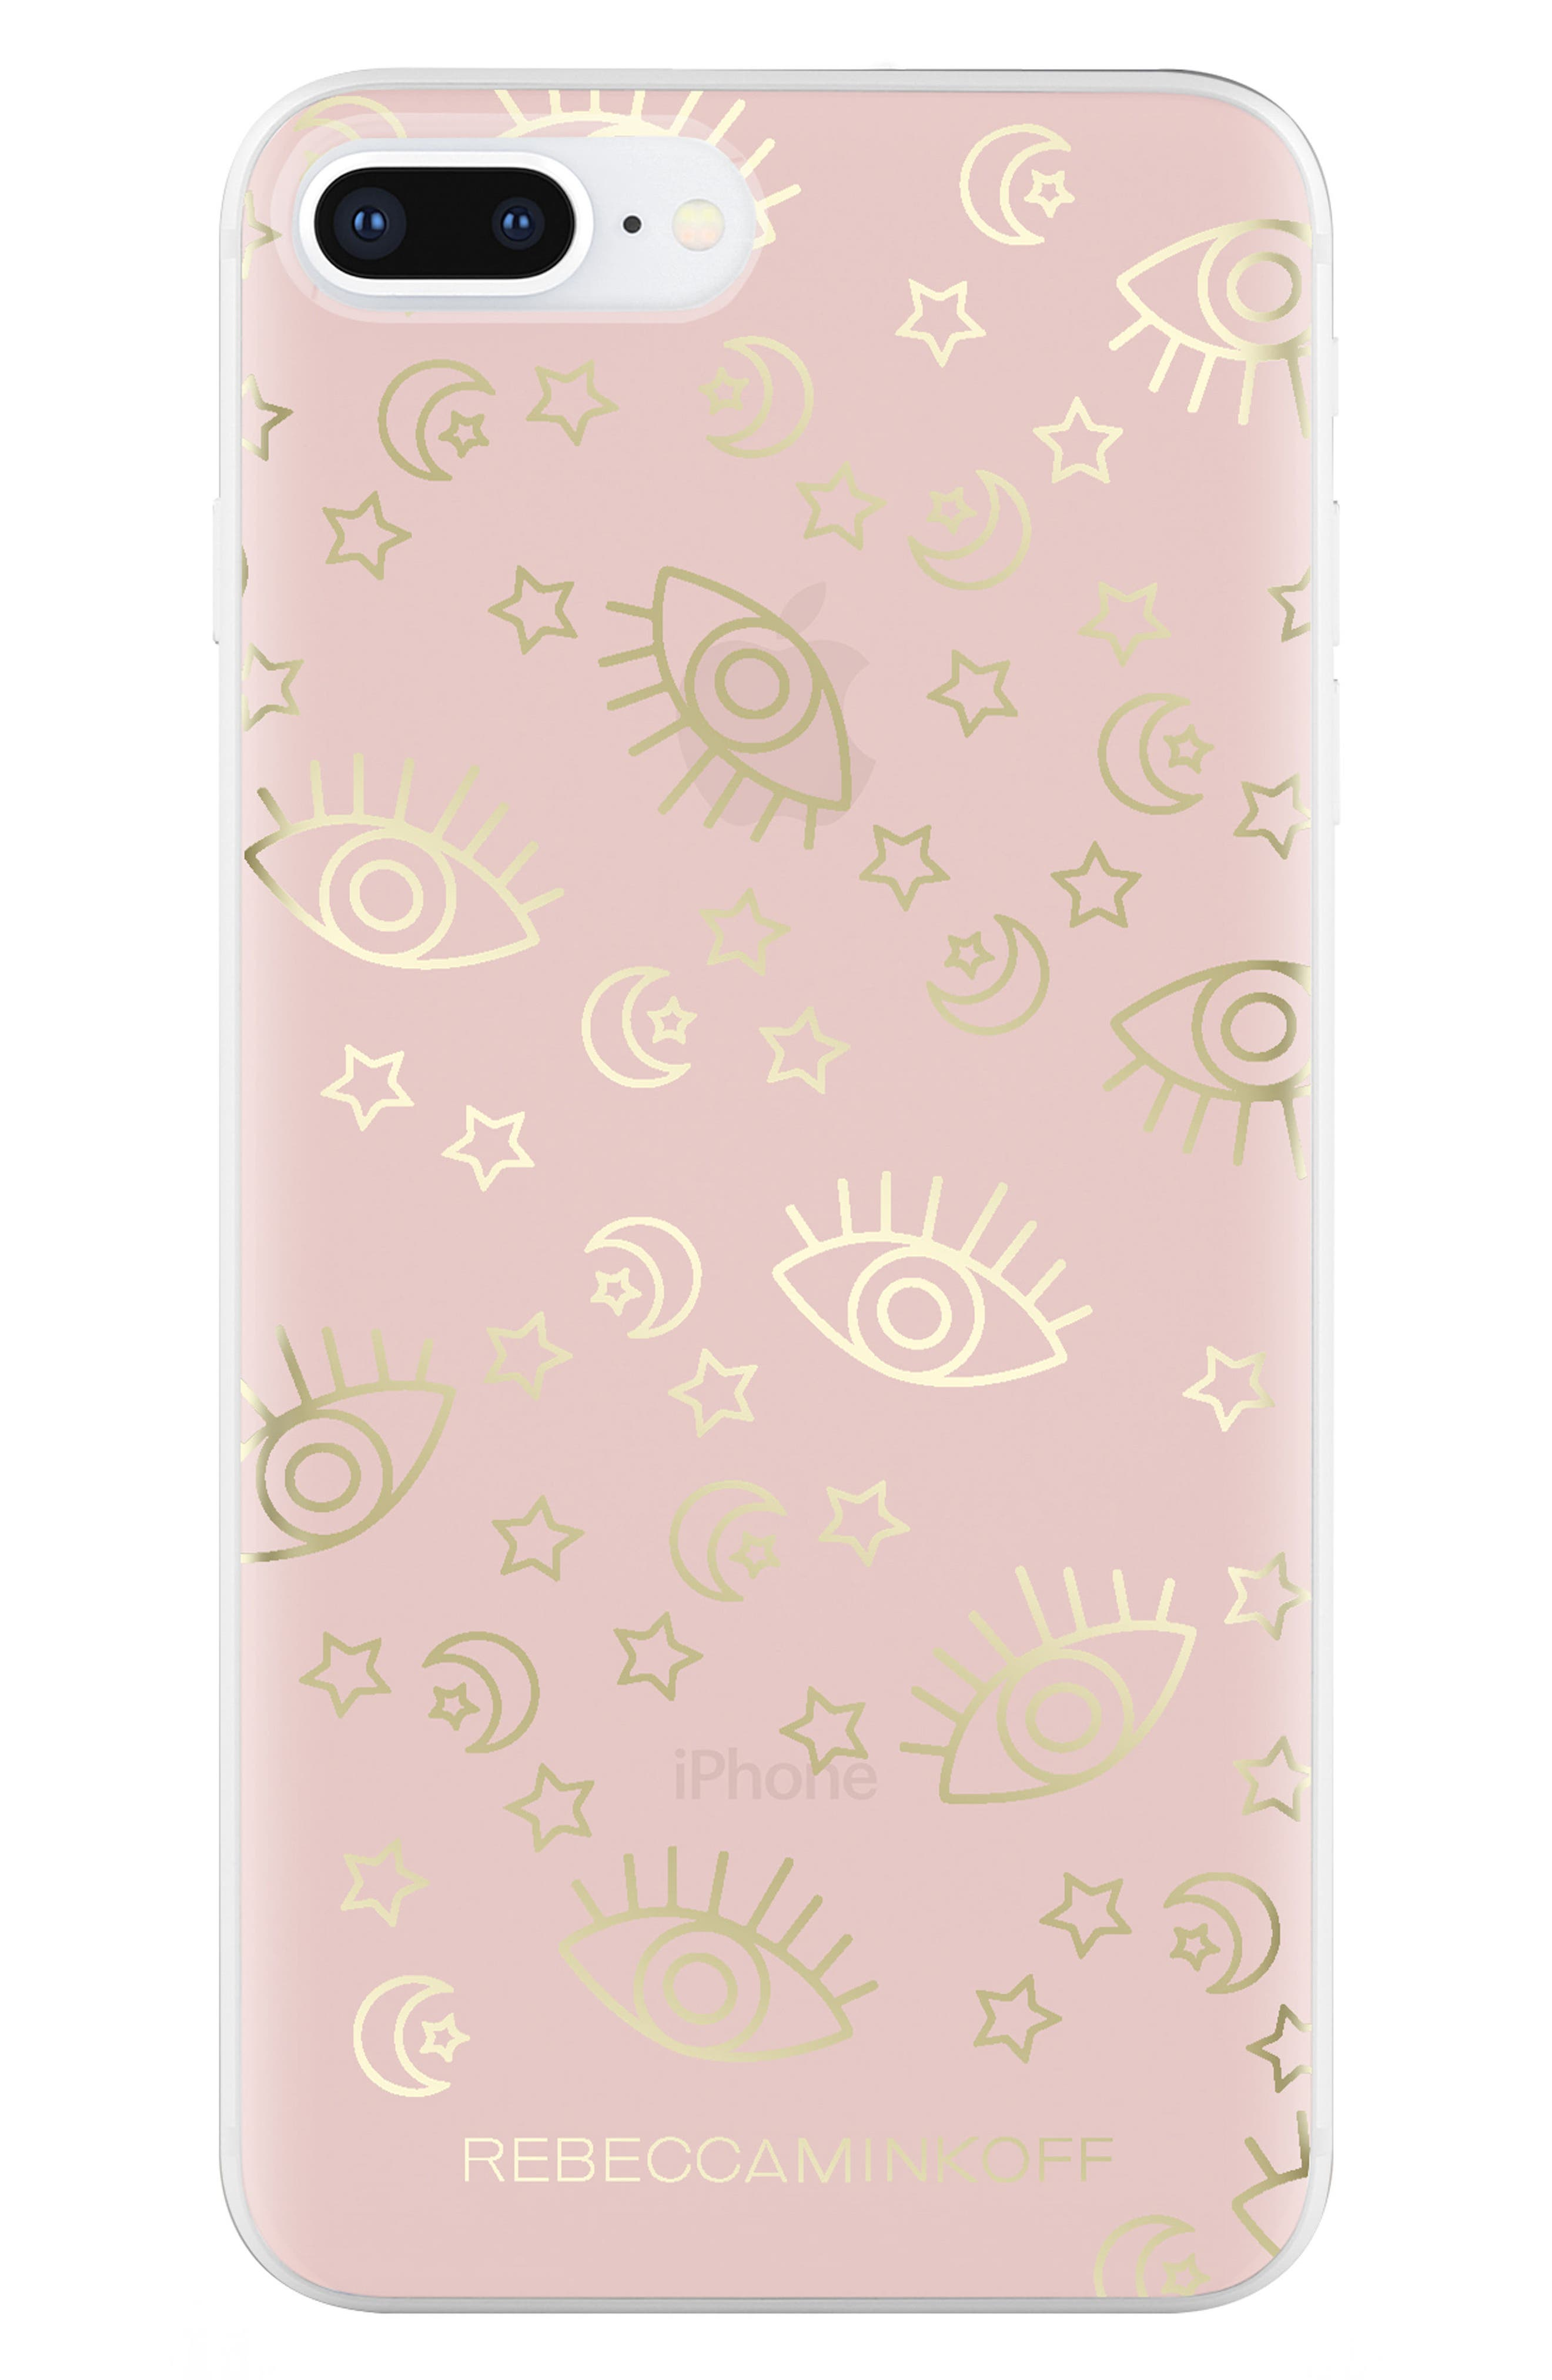 Metallic Galaxy Icon iPhone 7/8 & 7/8 Plus Case,                             Alternate thumbnail 4, color,                             Rose Gold/ Gold Foil